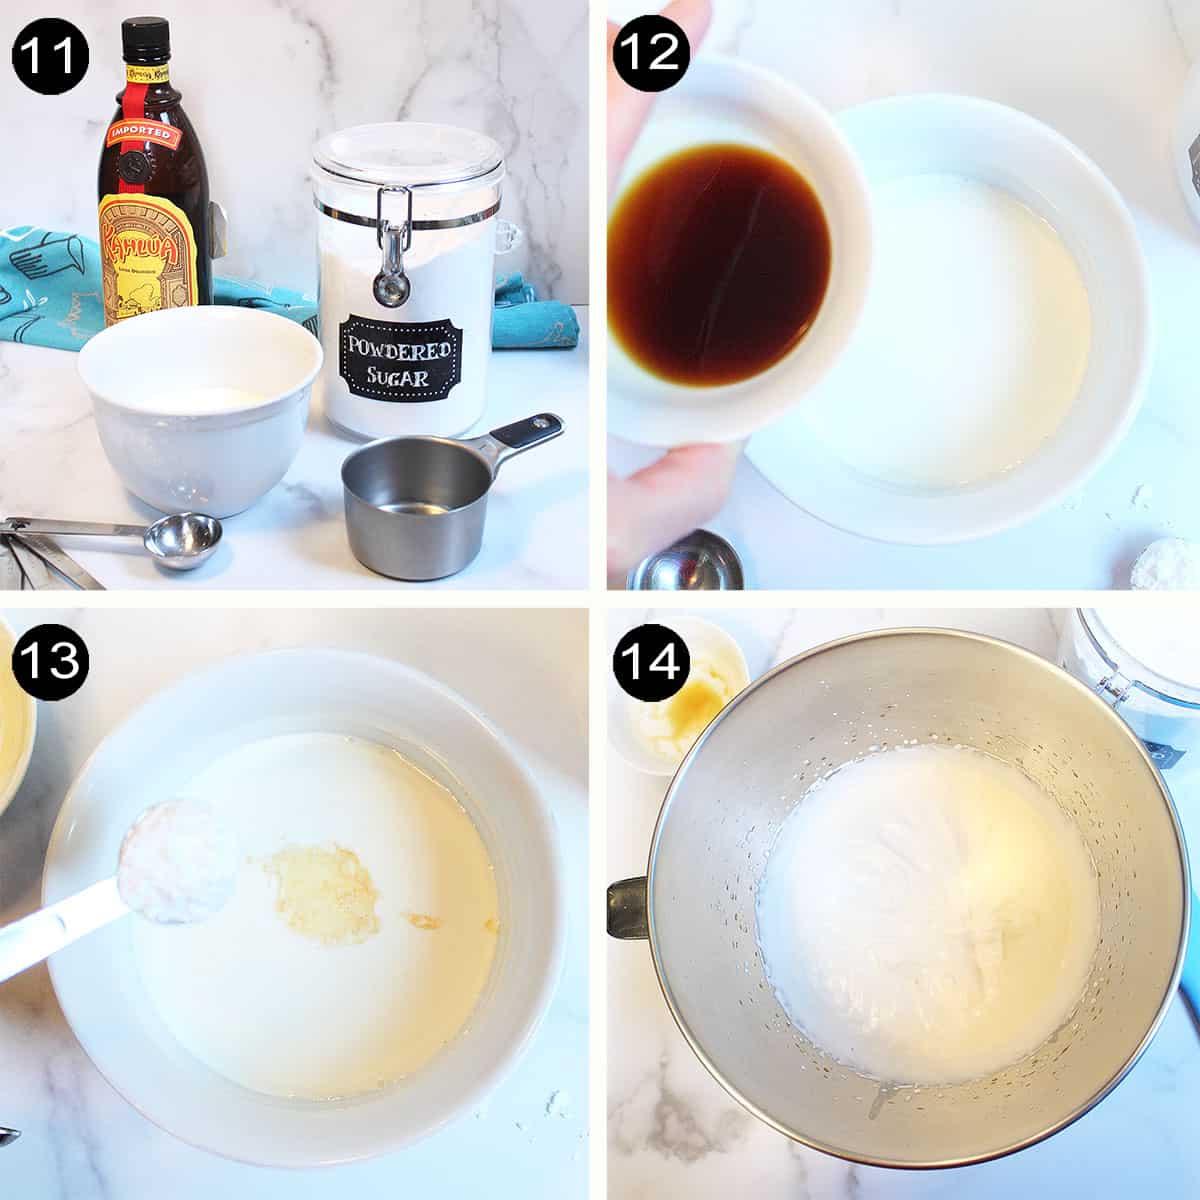 Steps to make kahlua whipped cream topping.